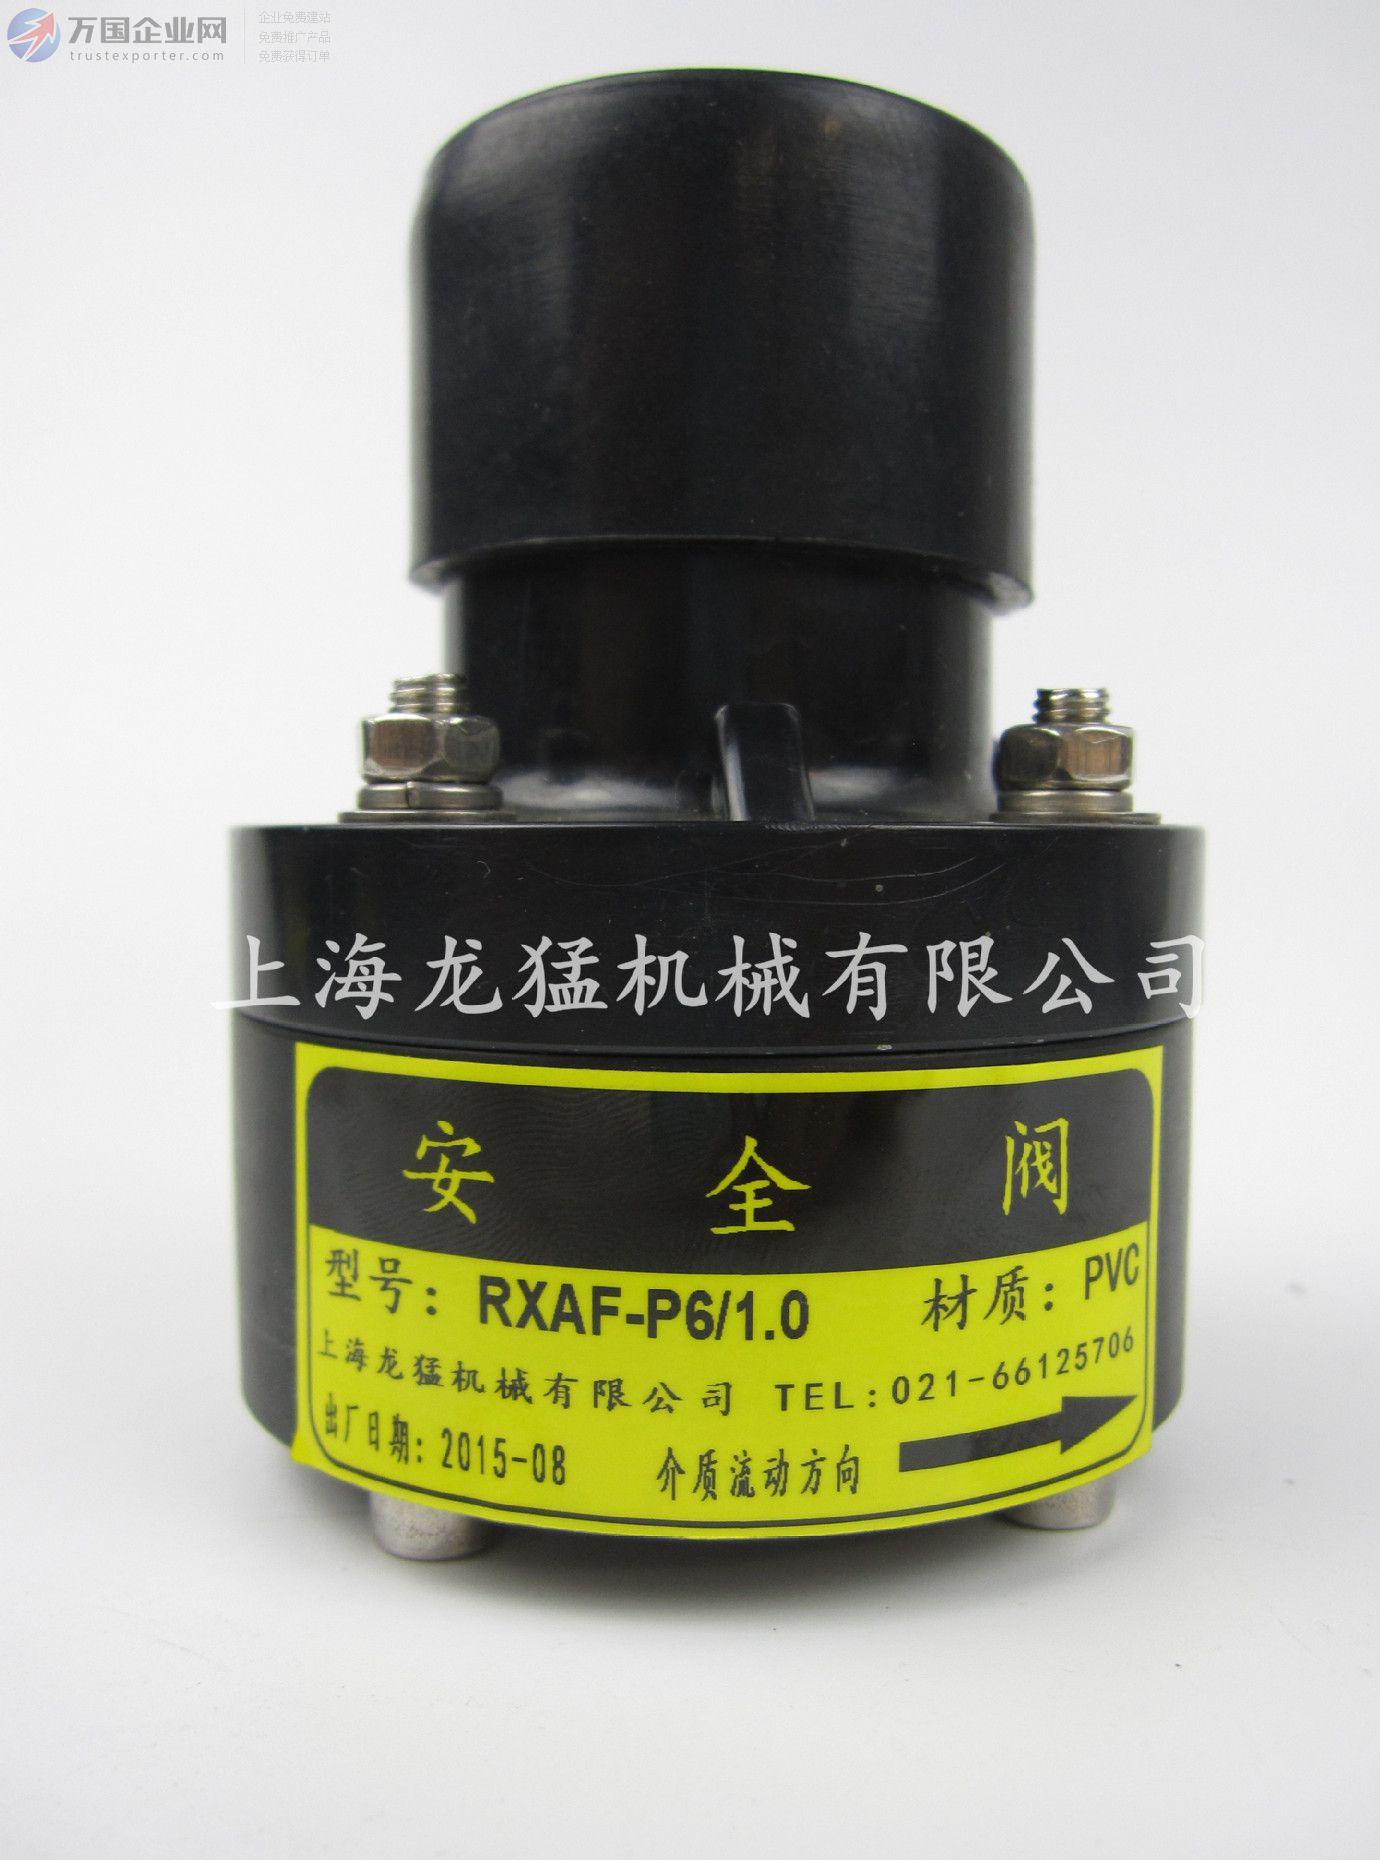 PVC耐腐蚀安全阀微启式安全阀 弹簧式 隔膜式 二通式